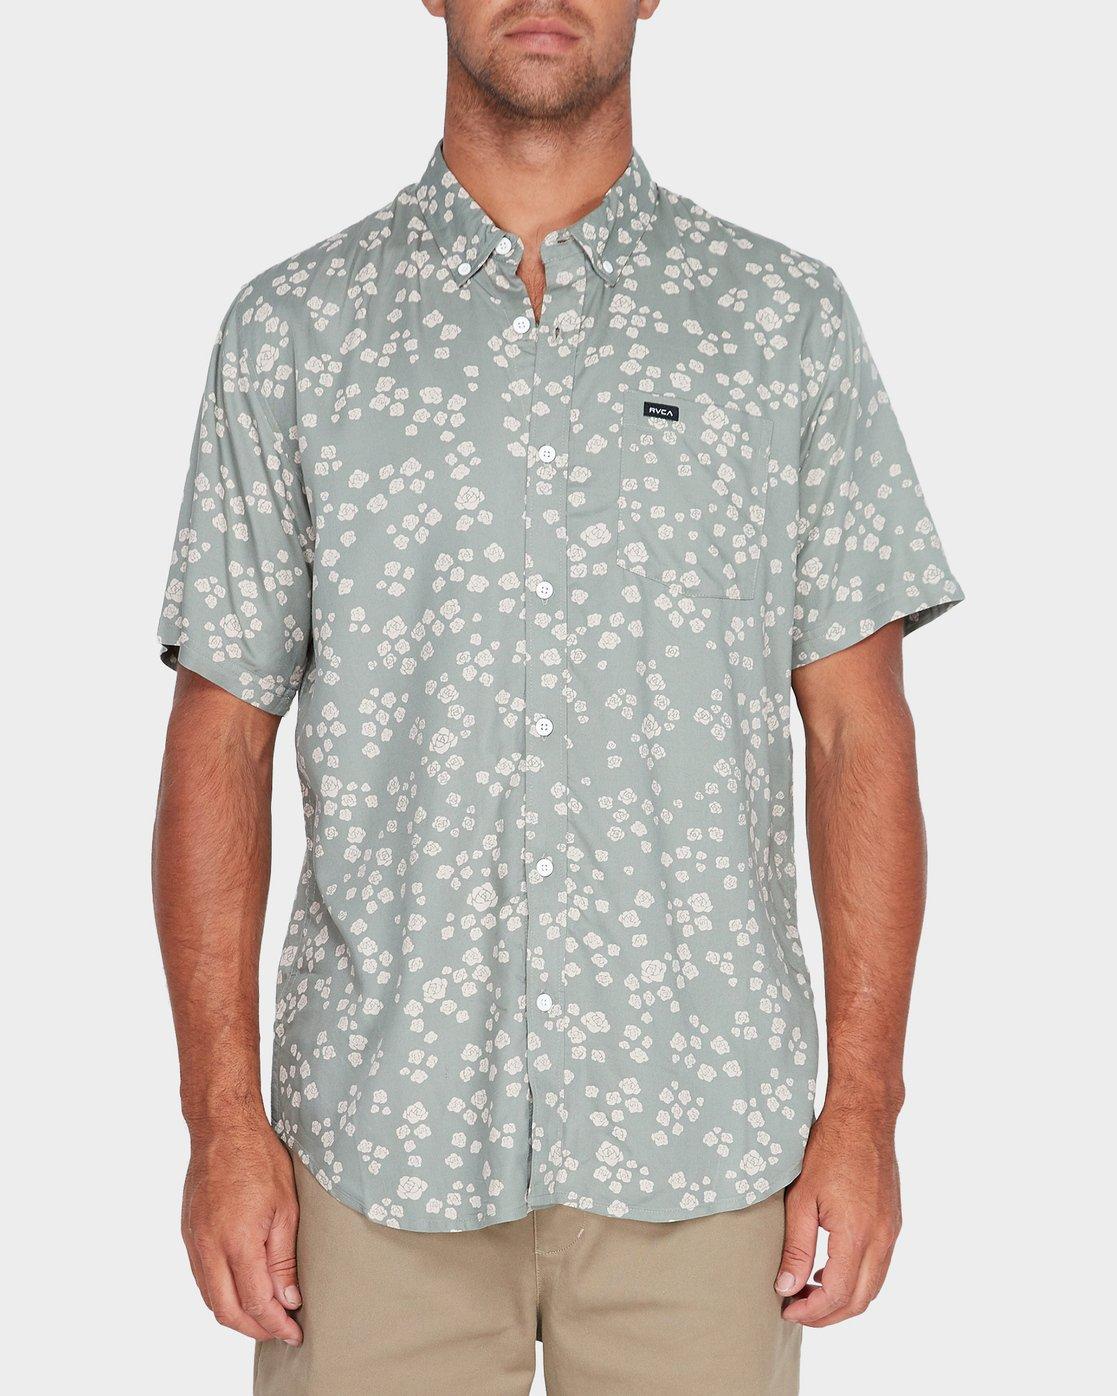 0 Yth RVCA Rosa Short Sleeve Shirt Green R582181 RVCA